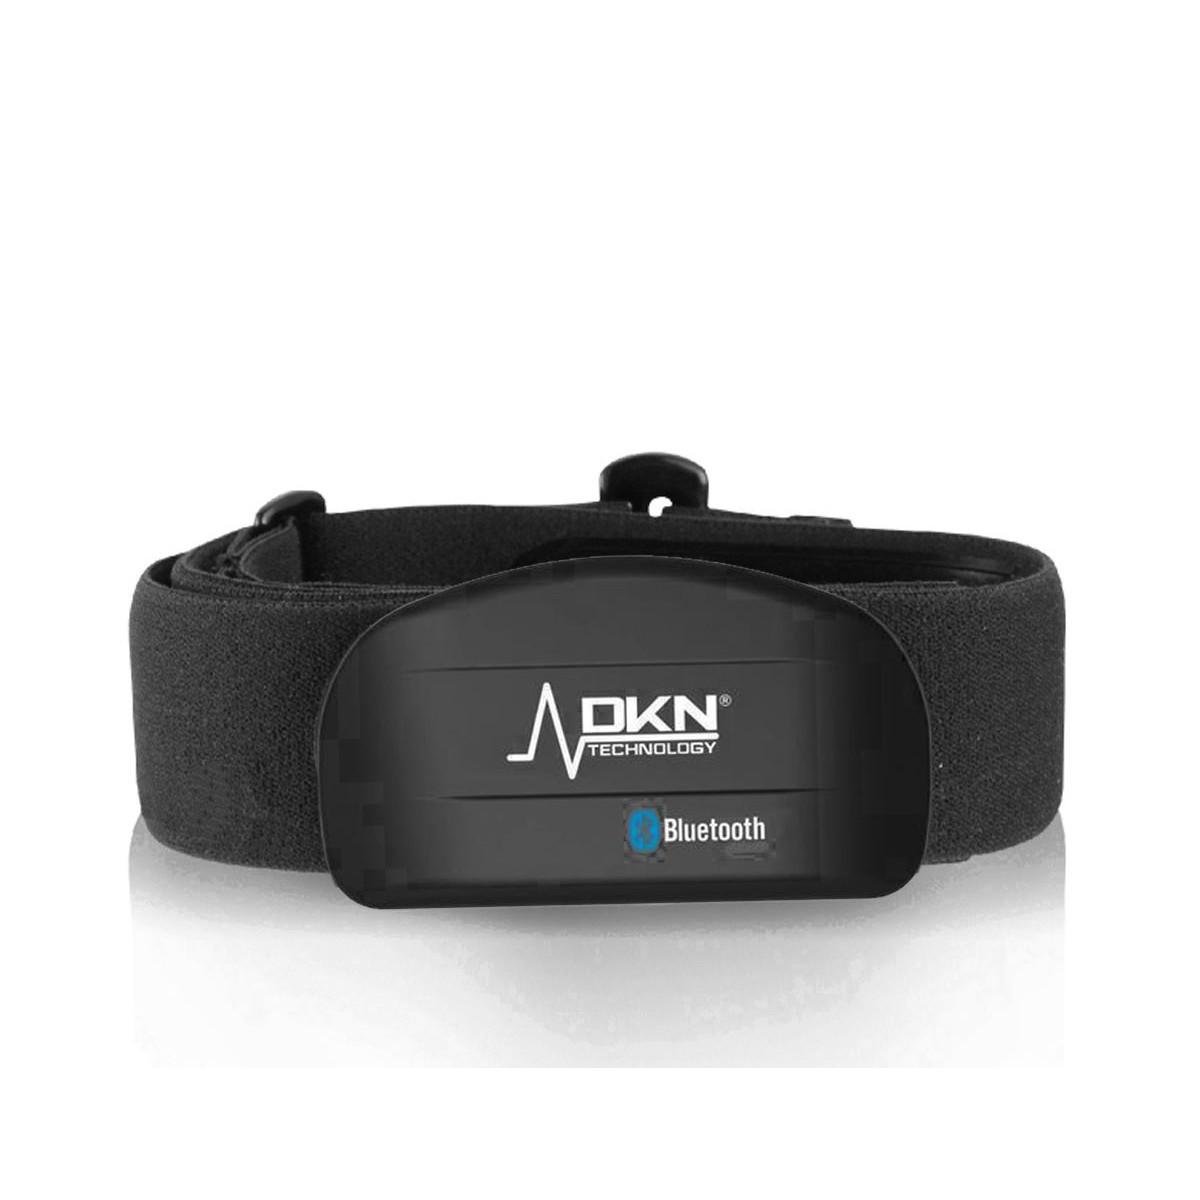 DKN Loopband AiRUN-Z